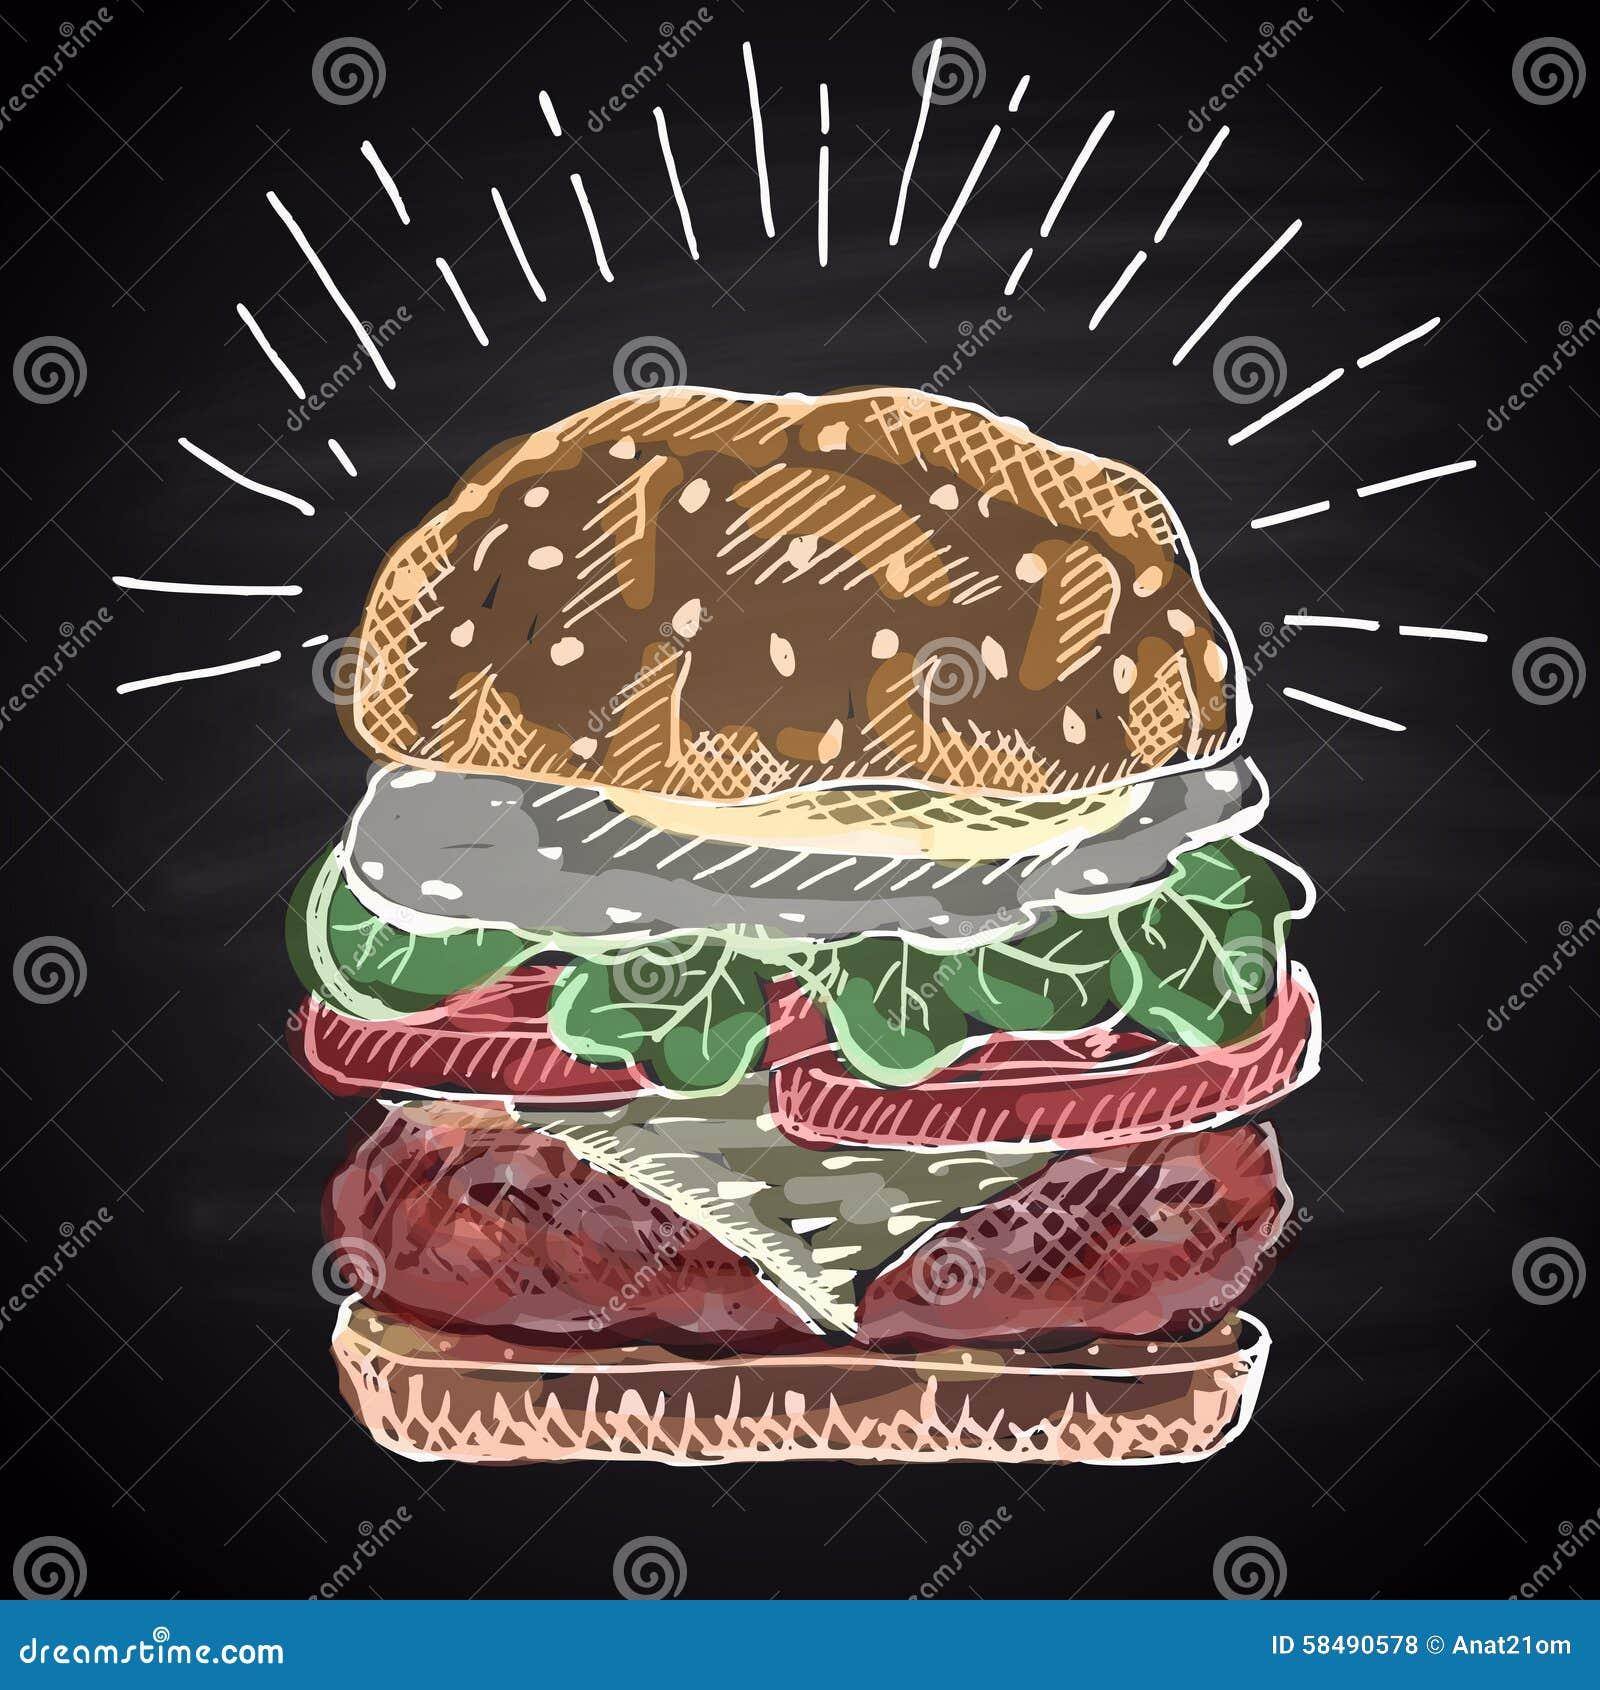 Chalk Drawn Colored Illustration Burger. Stock Vector - Image ...